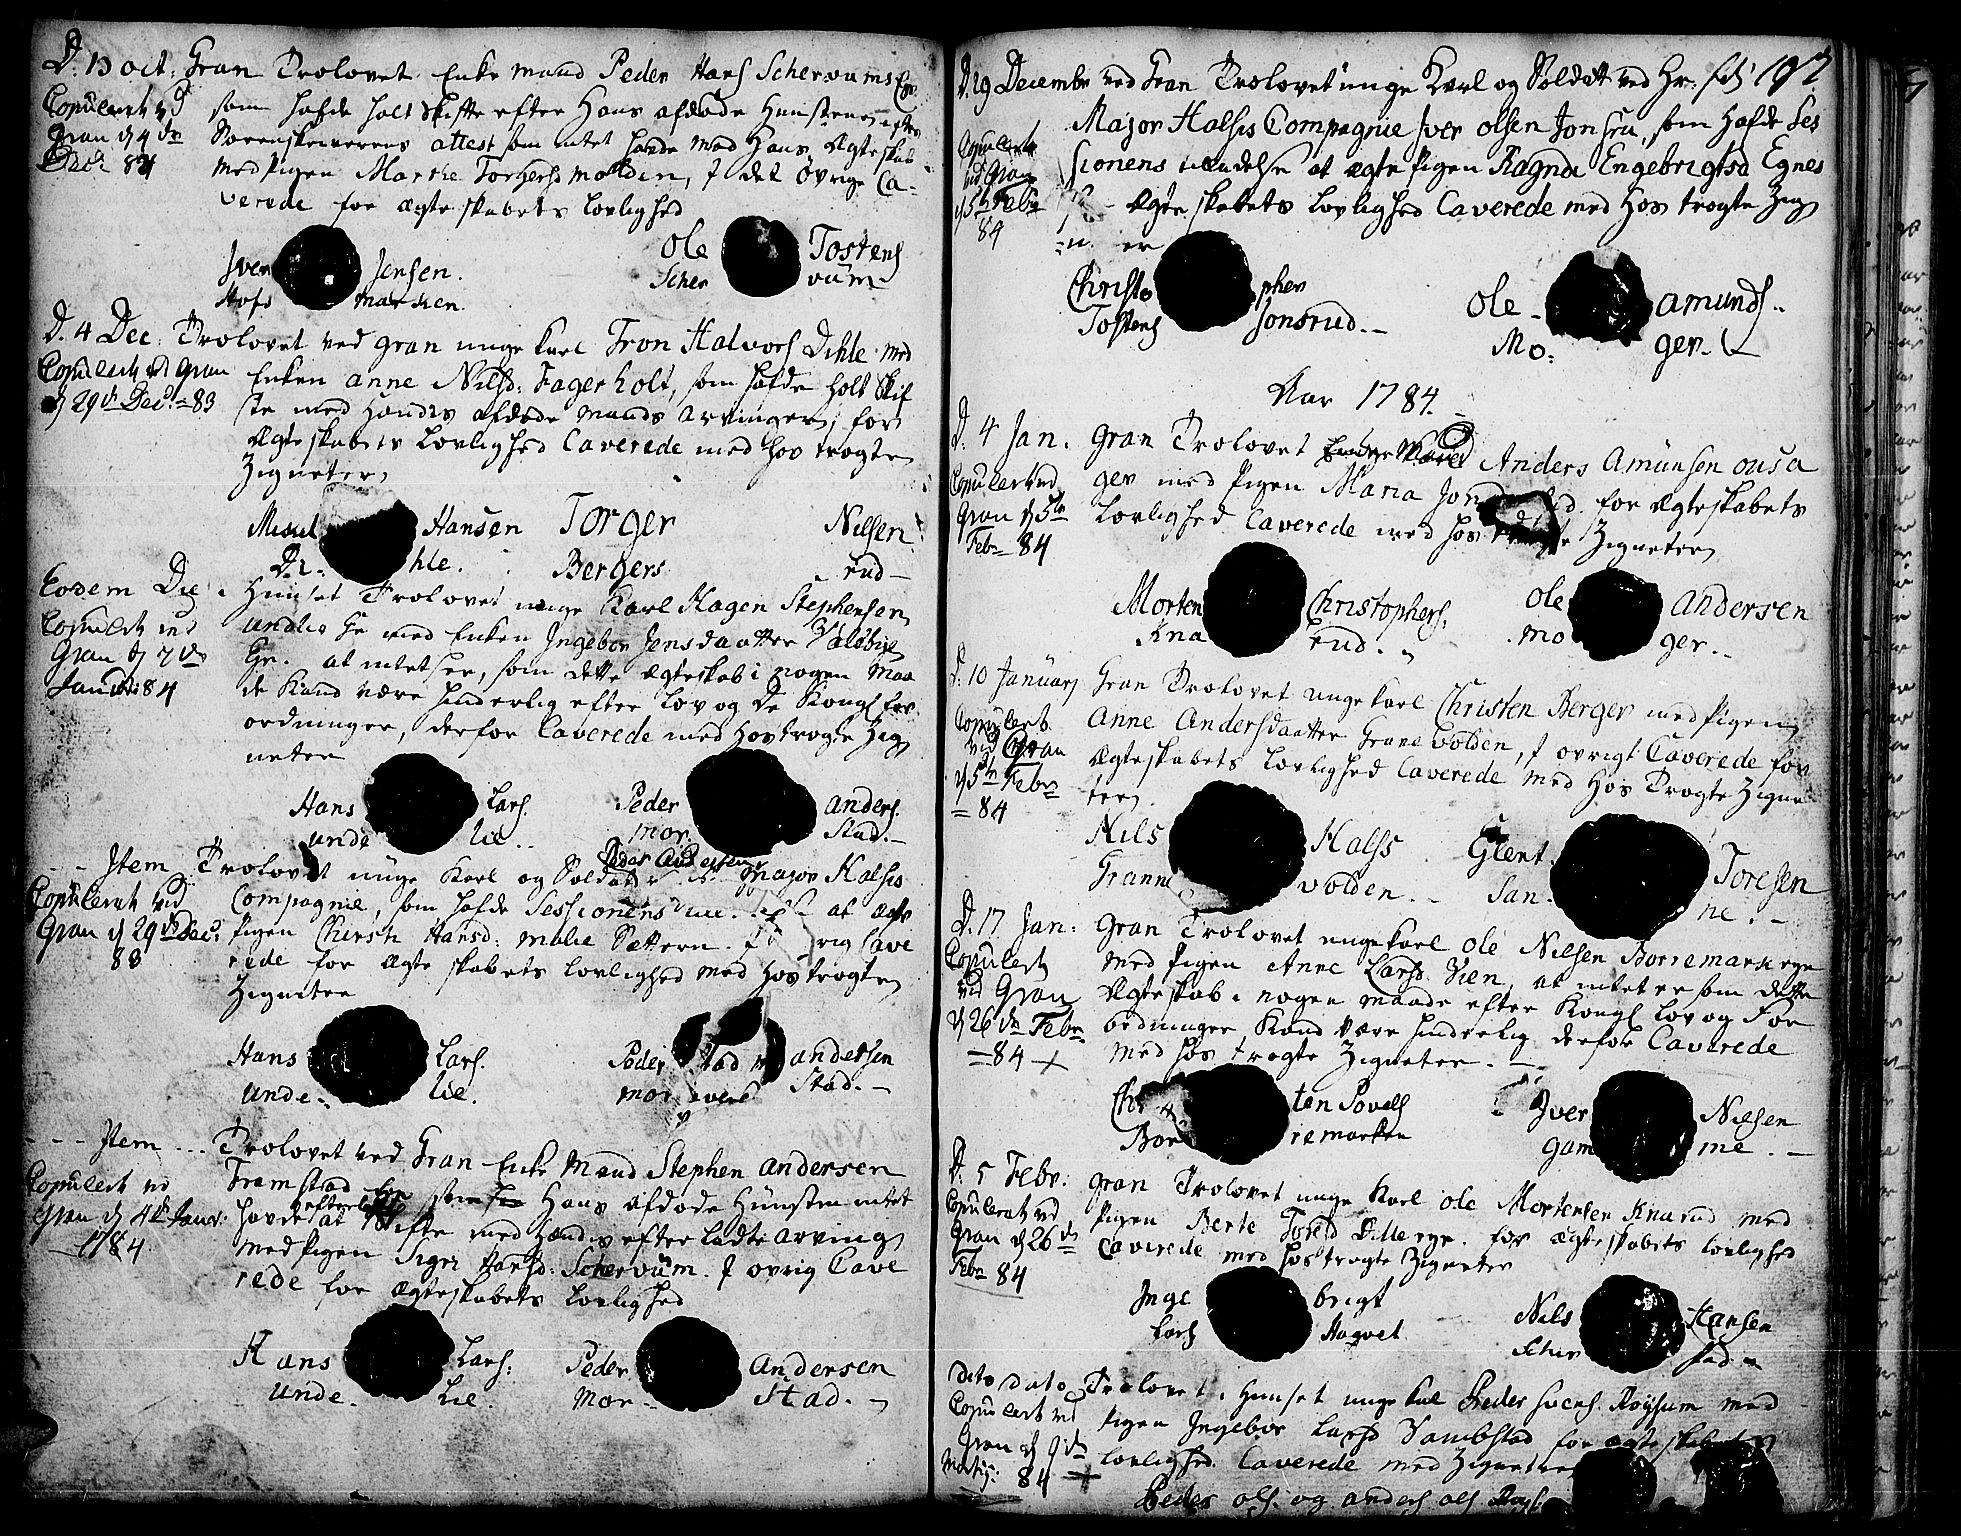 SAH, Gran prestekontor, Ministerialbok nr. 5, 1776-1788, s. 197